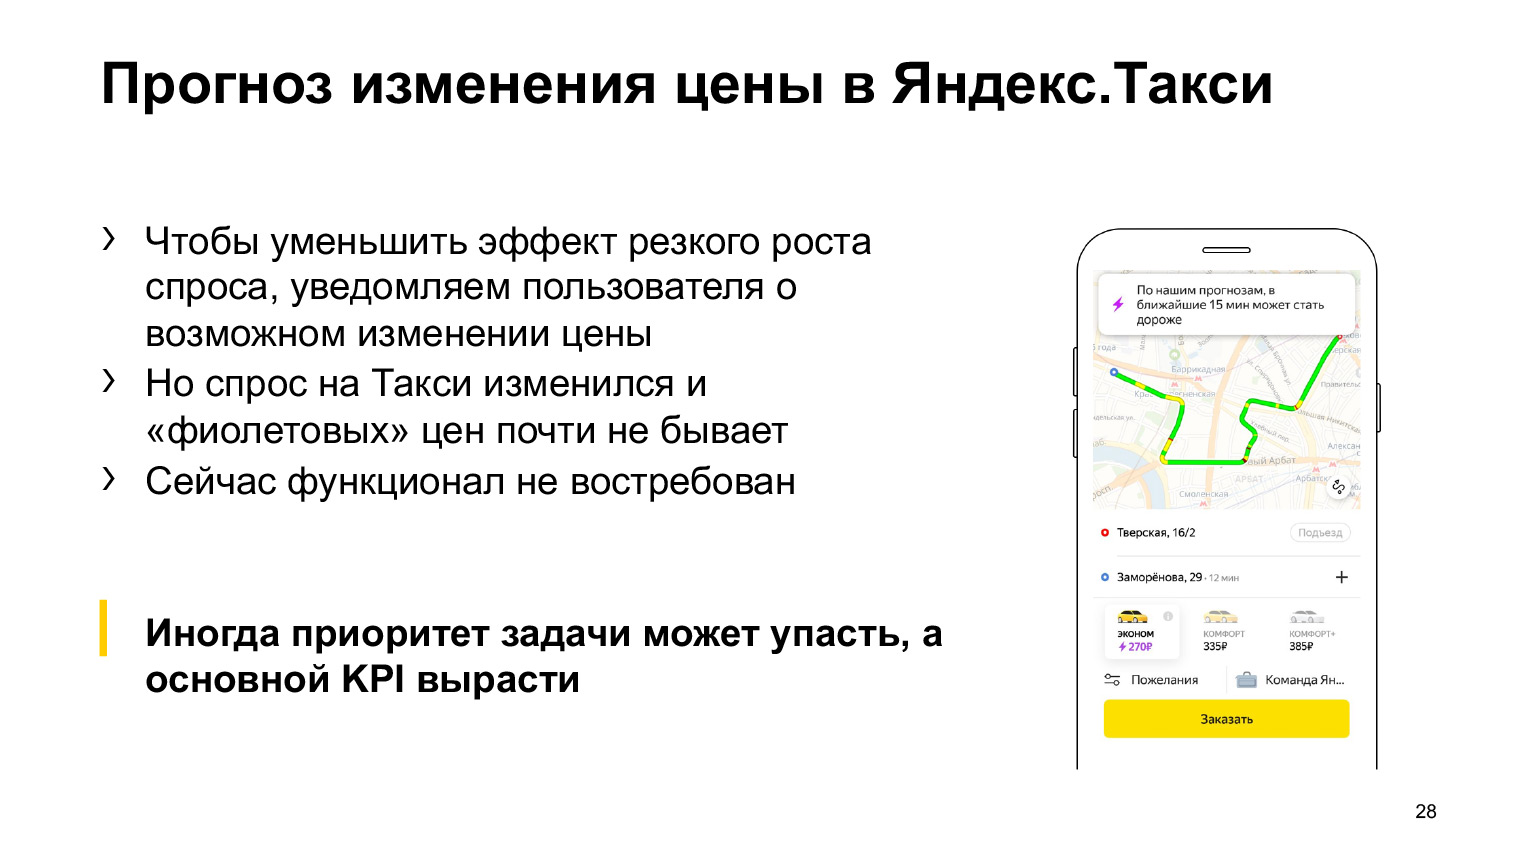 Как коронавирус повлиял на ML-проекты Такси, Еды и Лавки. Доклад Яндекса - 10